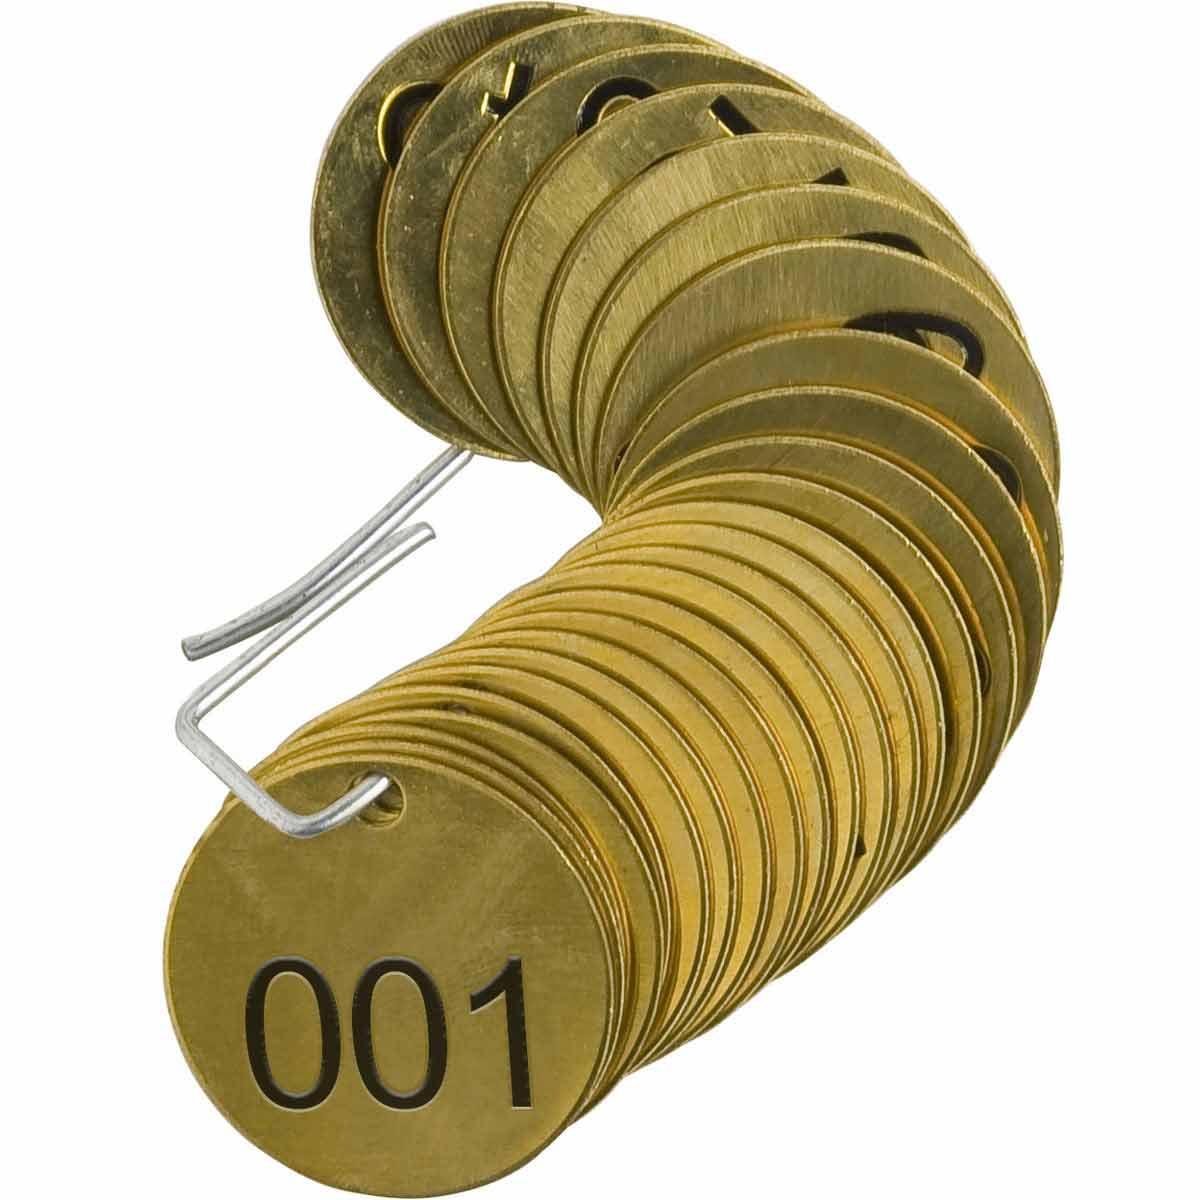 BRADY 23200 Stamped Brass Valve Tag